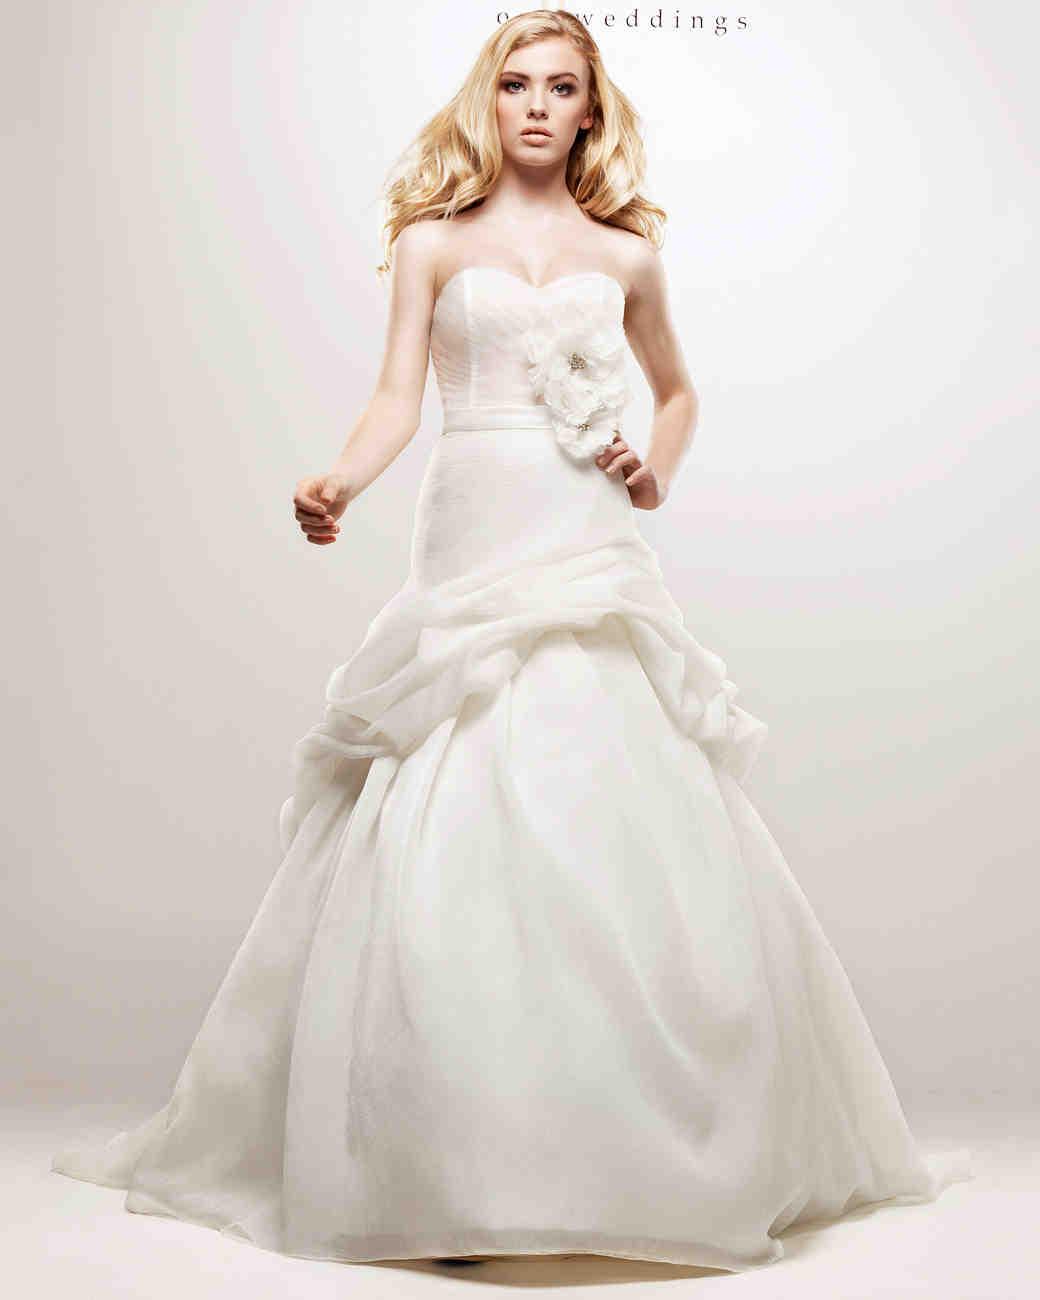 iconic-dresses-anaiss.jpg